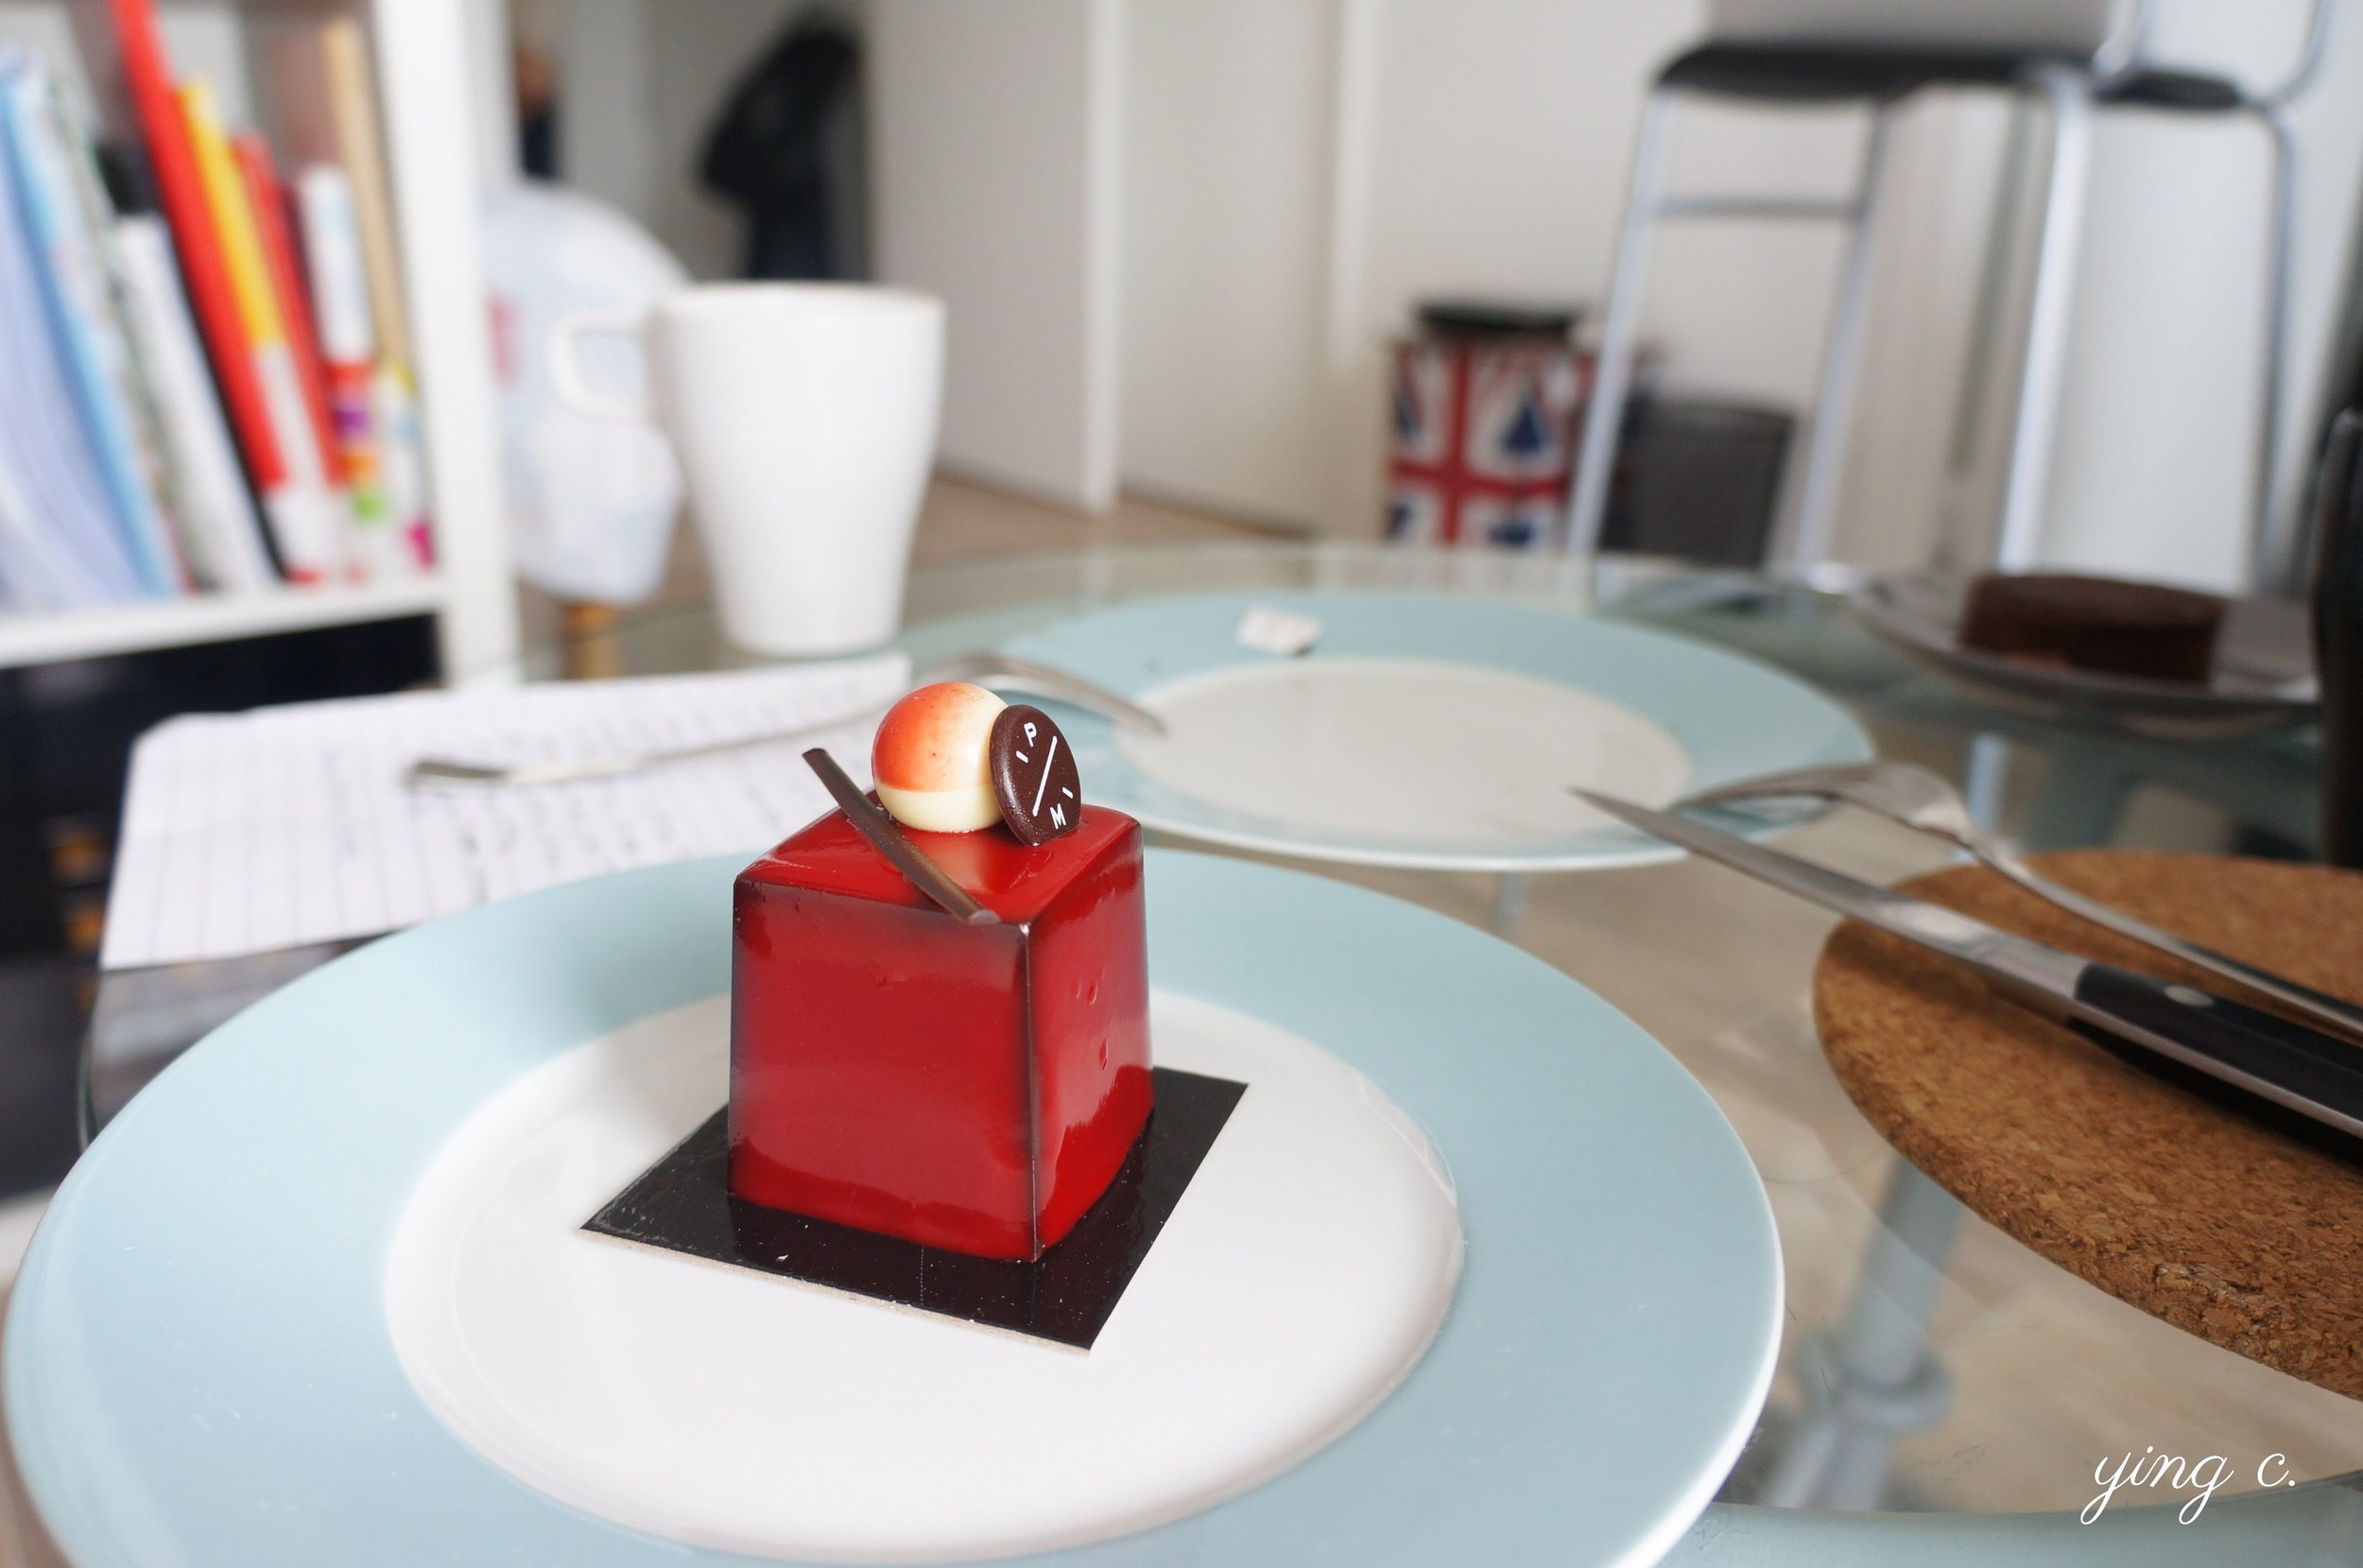 Pierre Marcolini的「Désir」系列酸櫻桃(griotte)口味,外形精緻、細節無懈可擊,如同一個精美的禮盒。